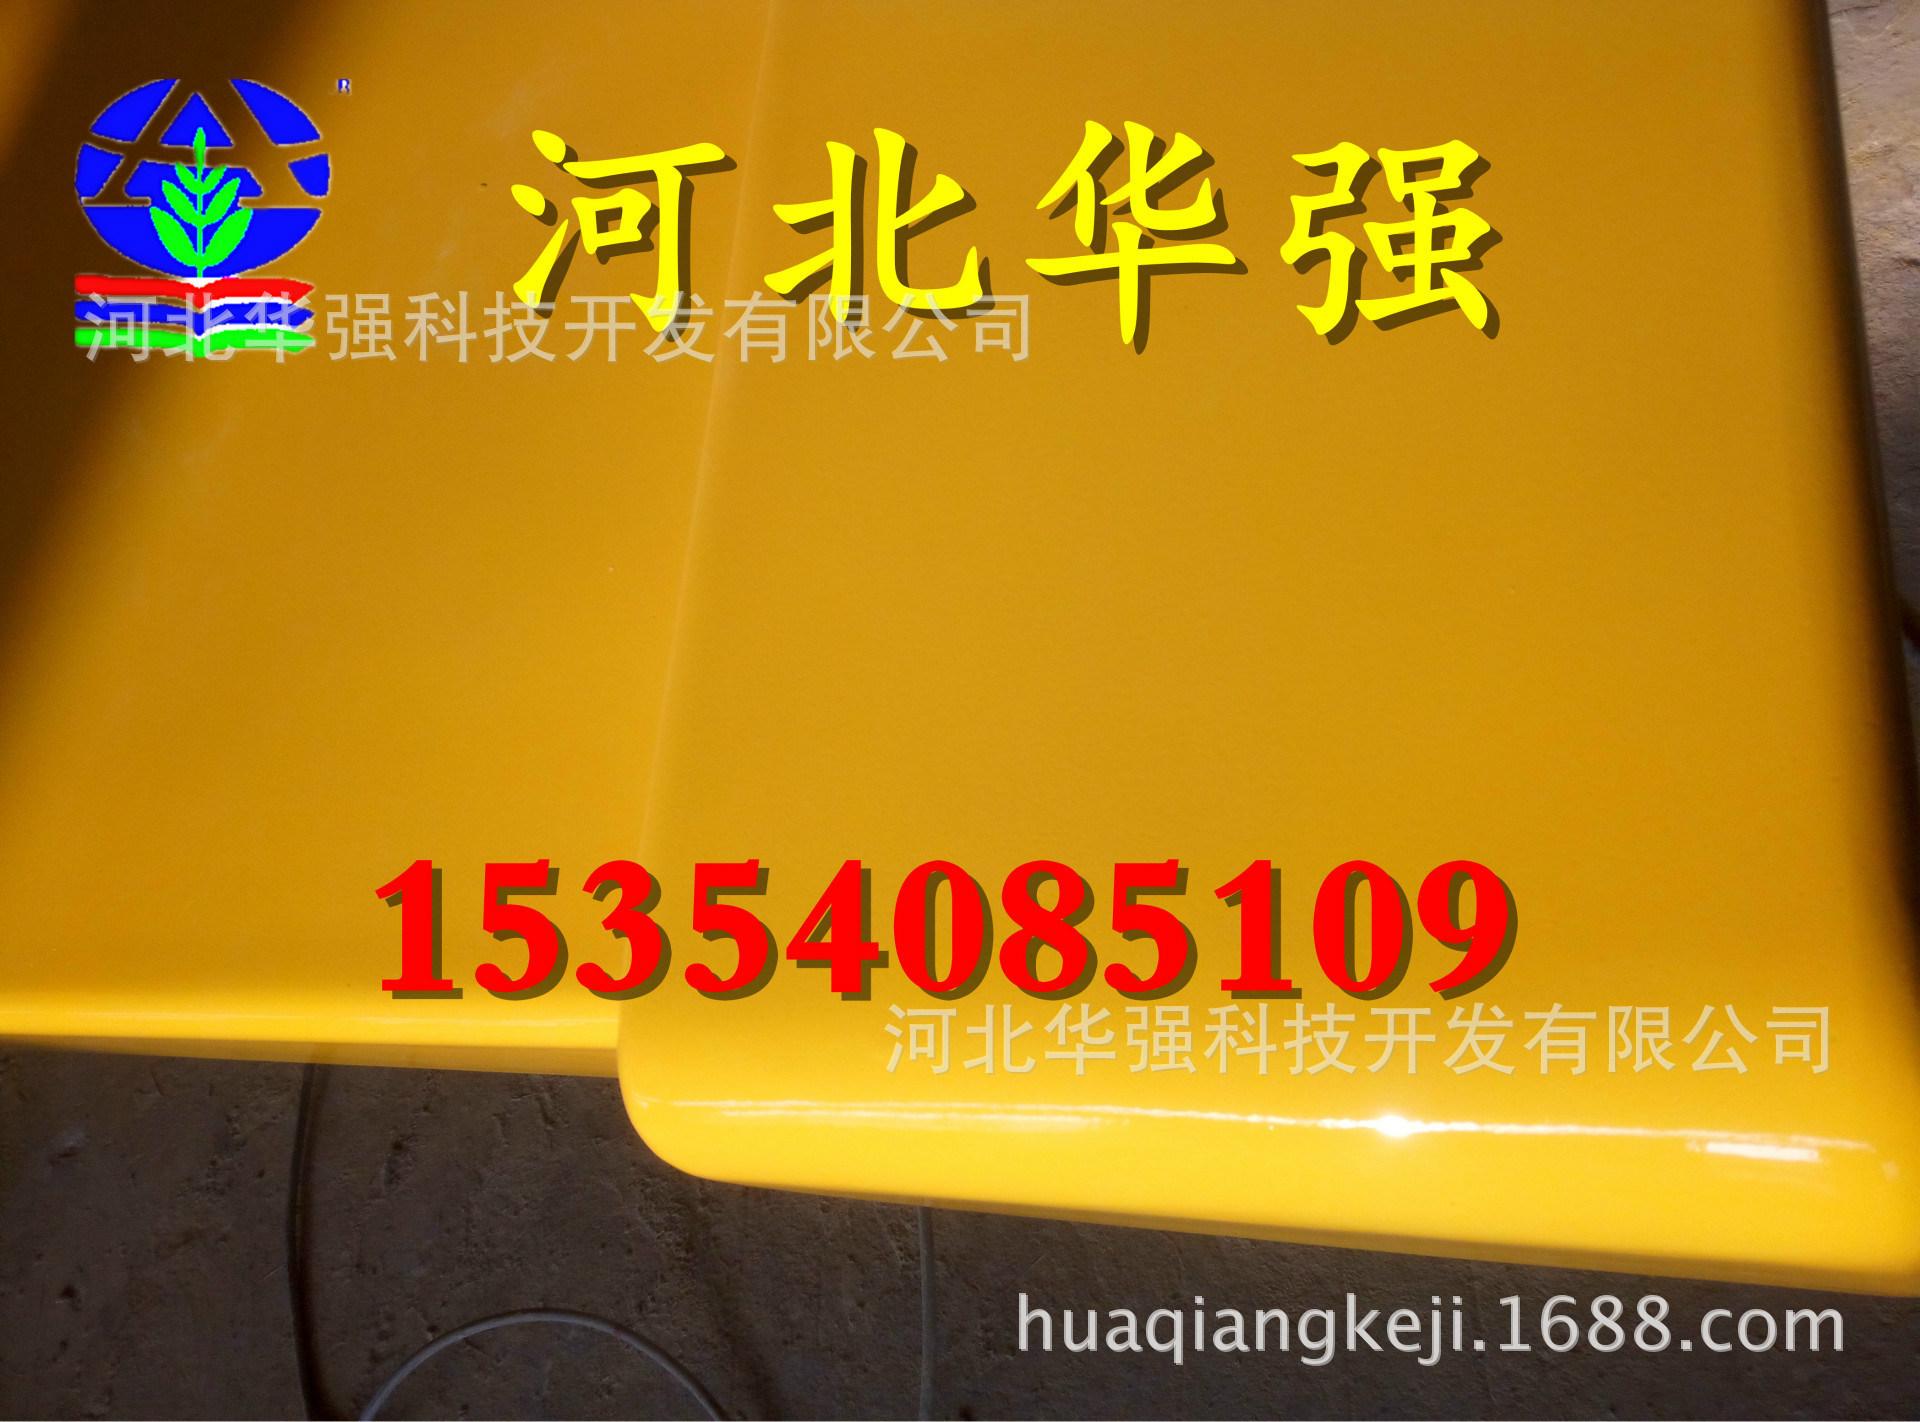 P61210-141933